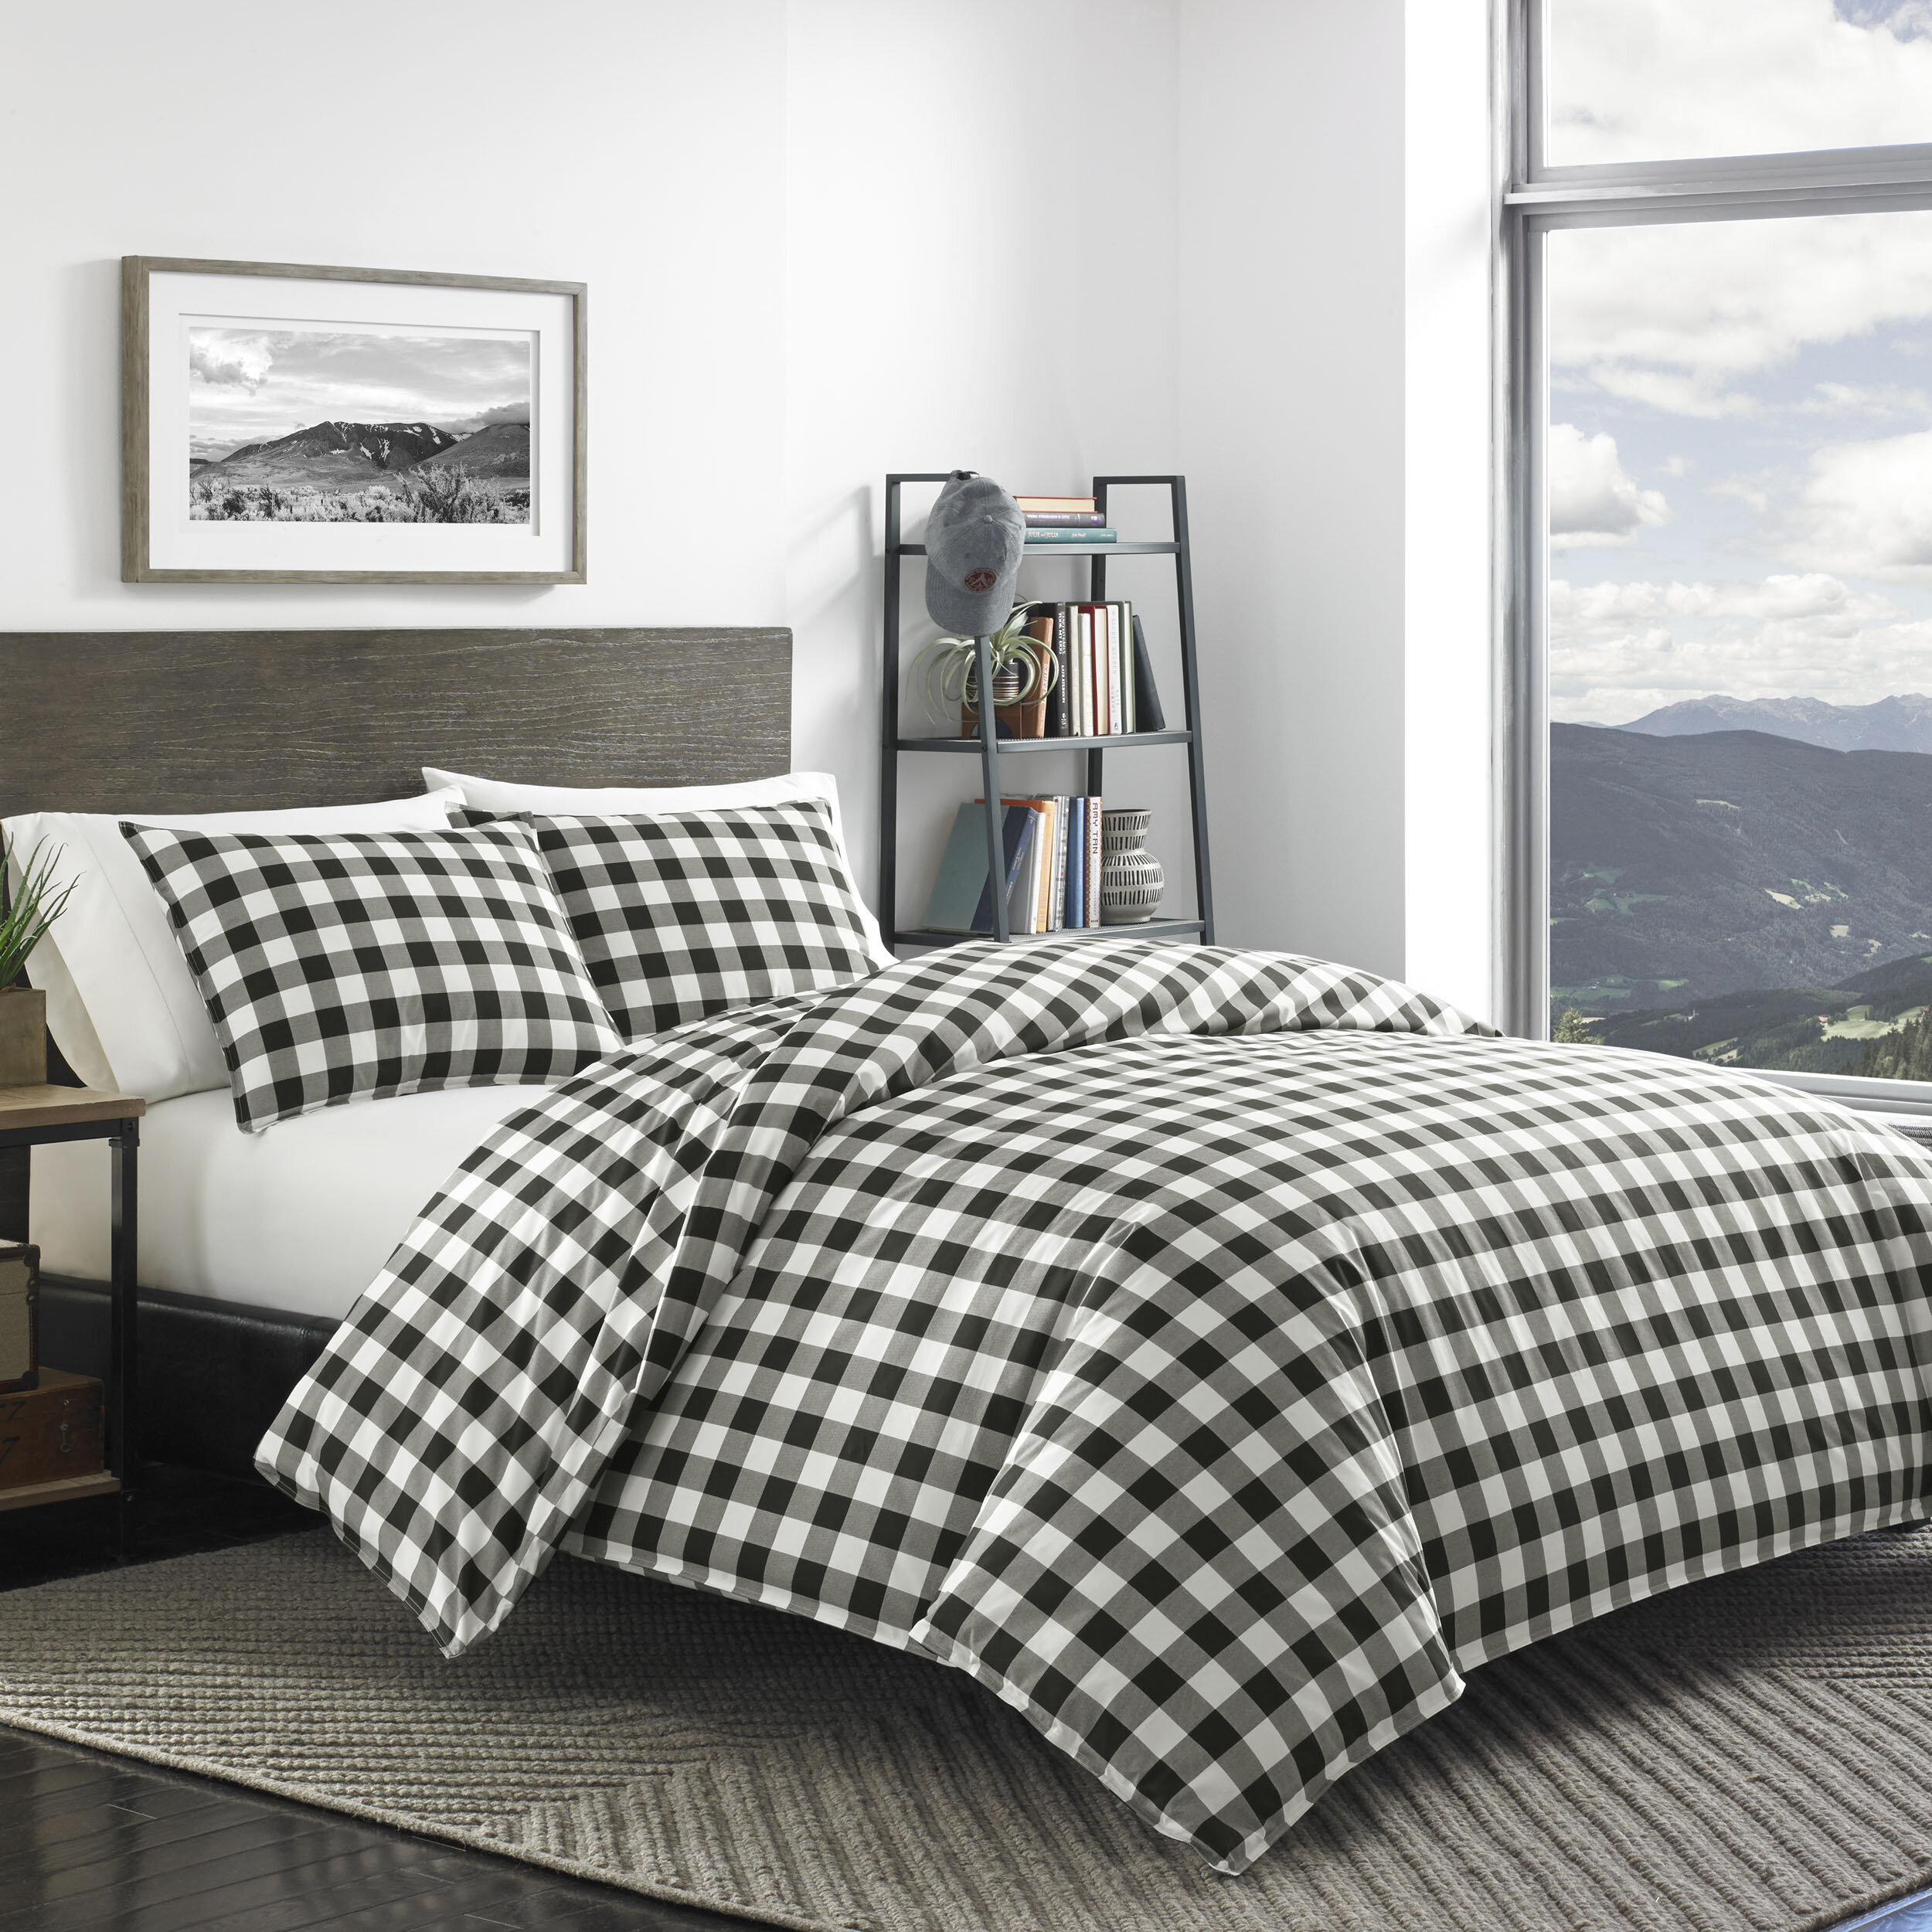 Wayfair Modern Farmhouse Bedding You Ll Love In 2021